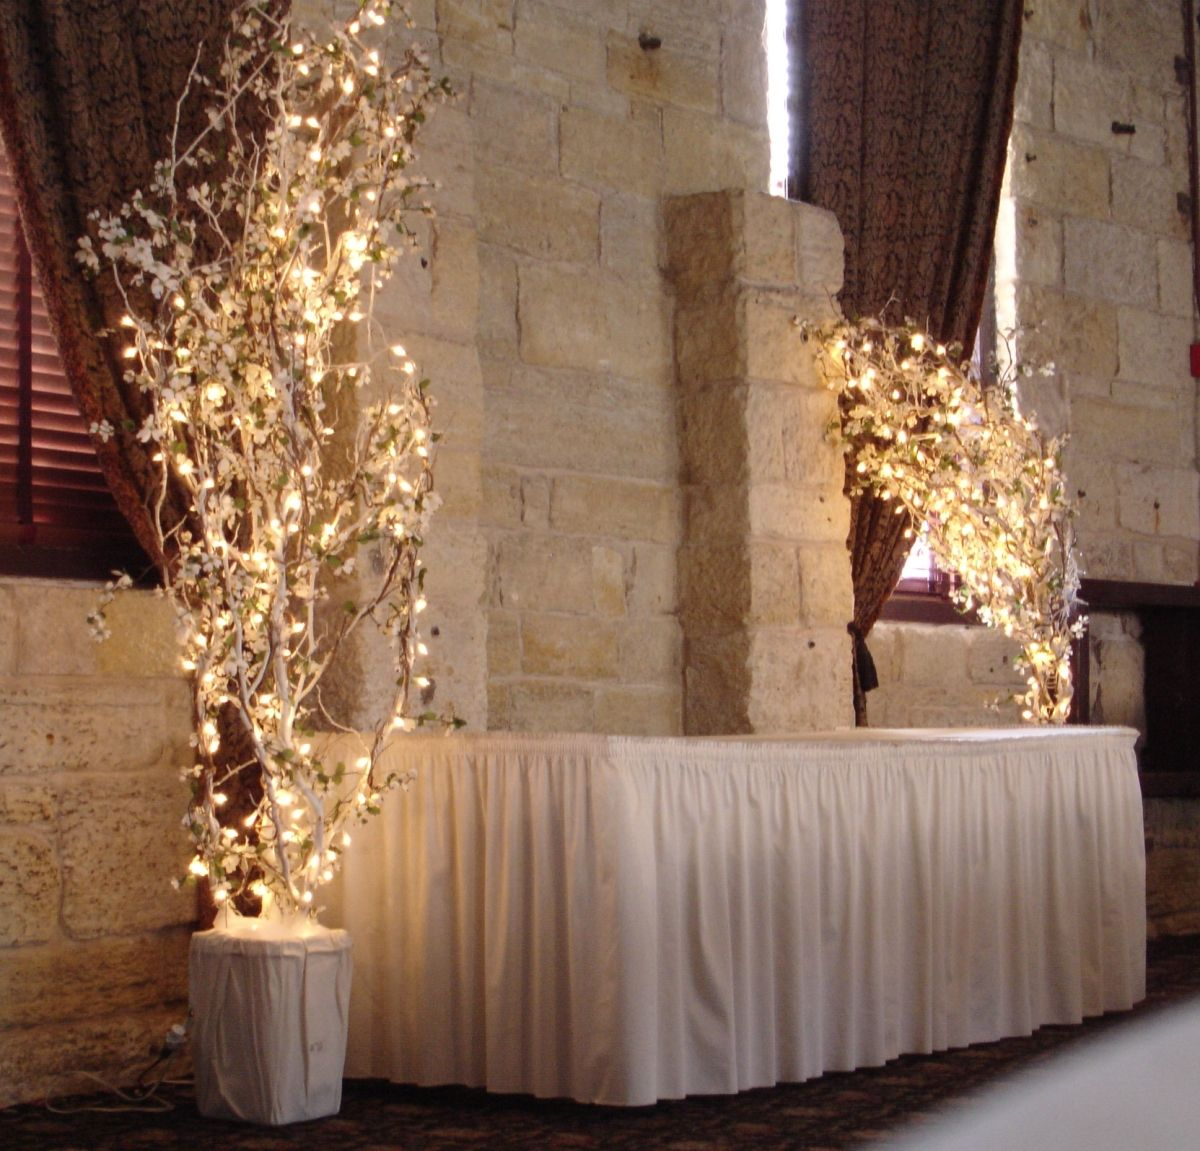 Wedding Gift Table: Wedding Gift Table, Cool Lights